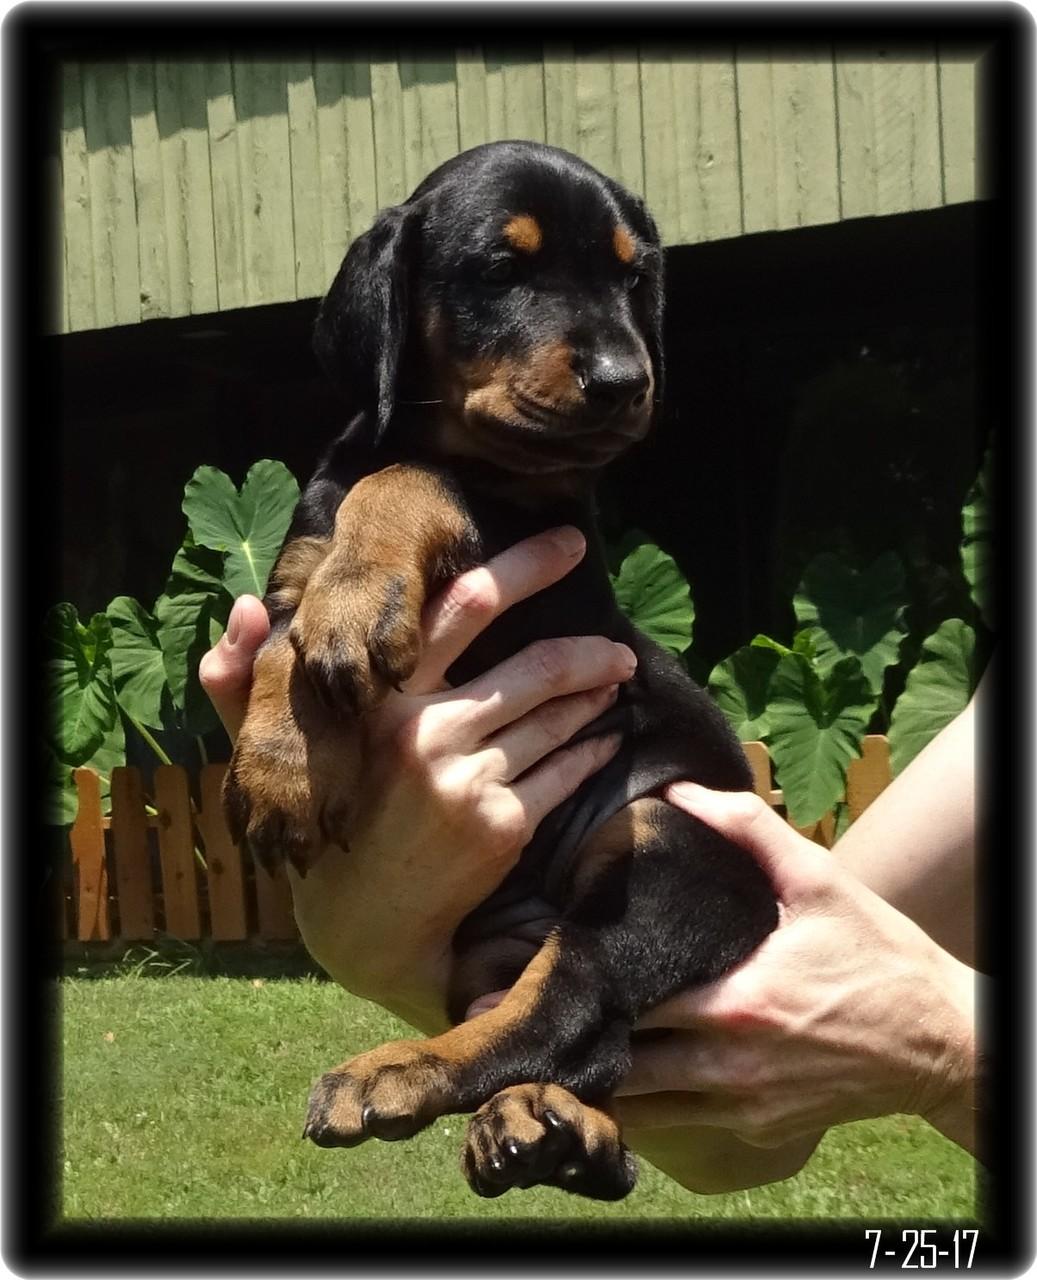 Side View of doberman pup with longer ears